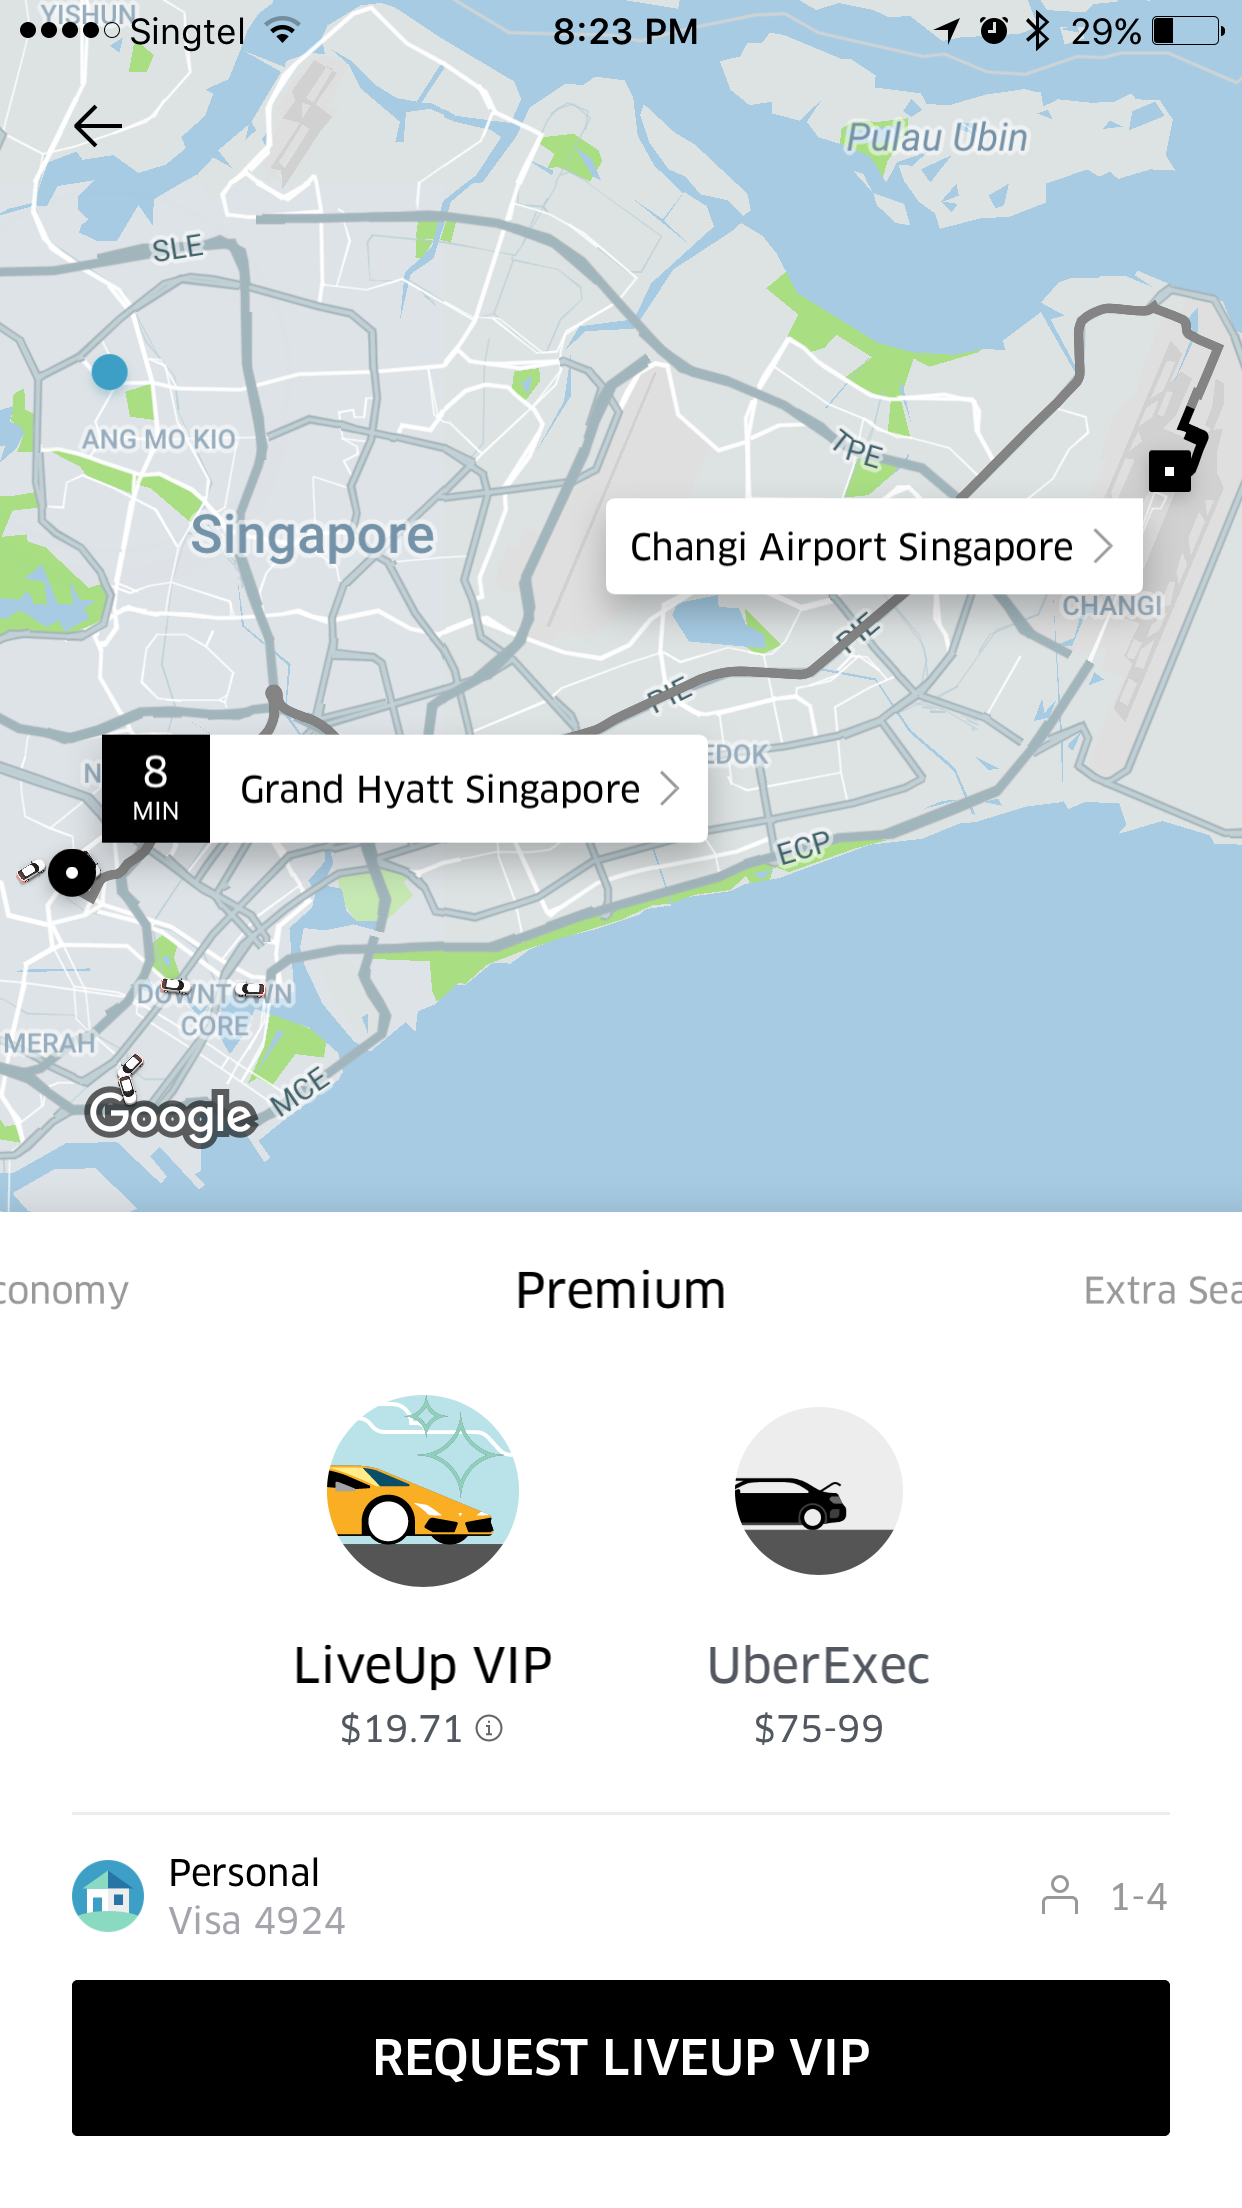 Uber VIP in Singapore